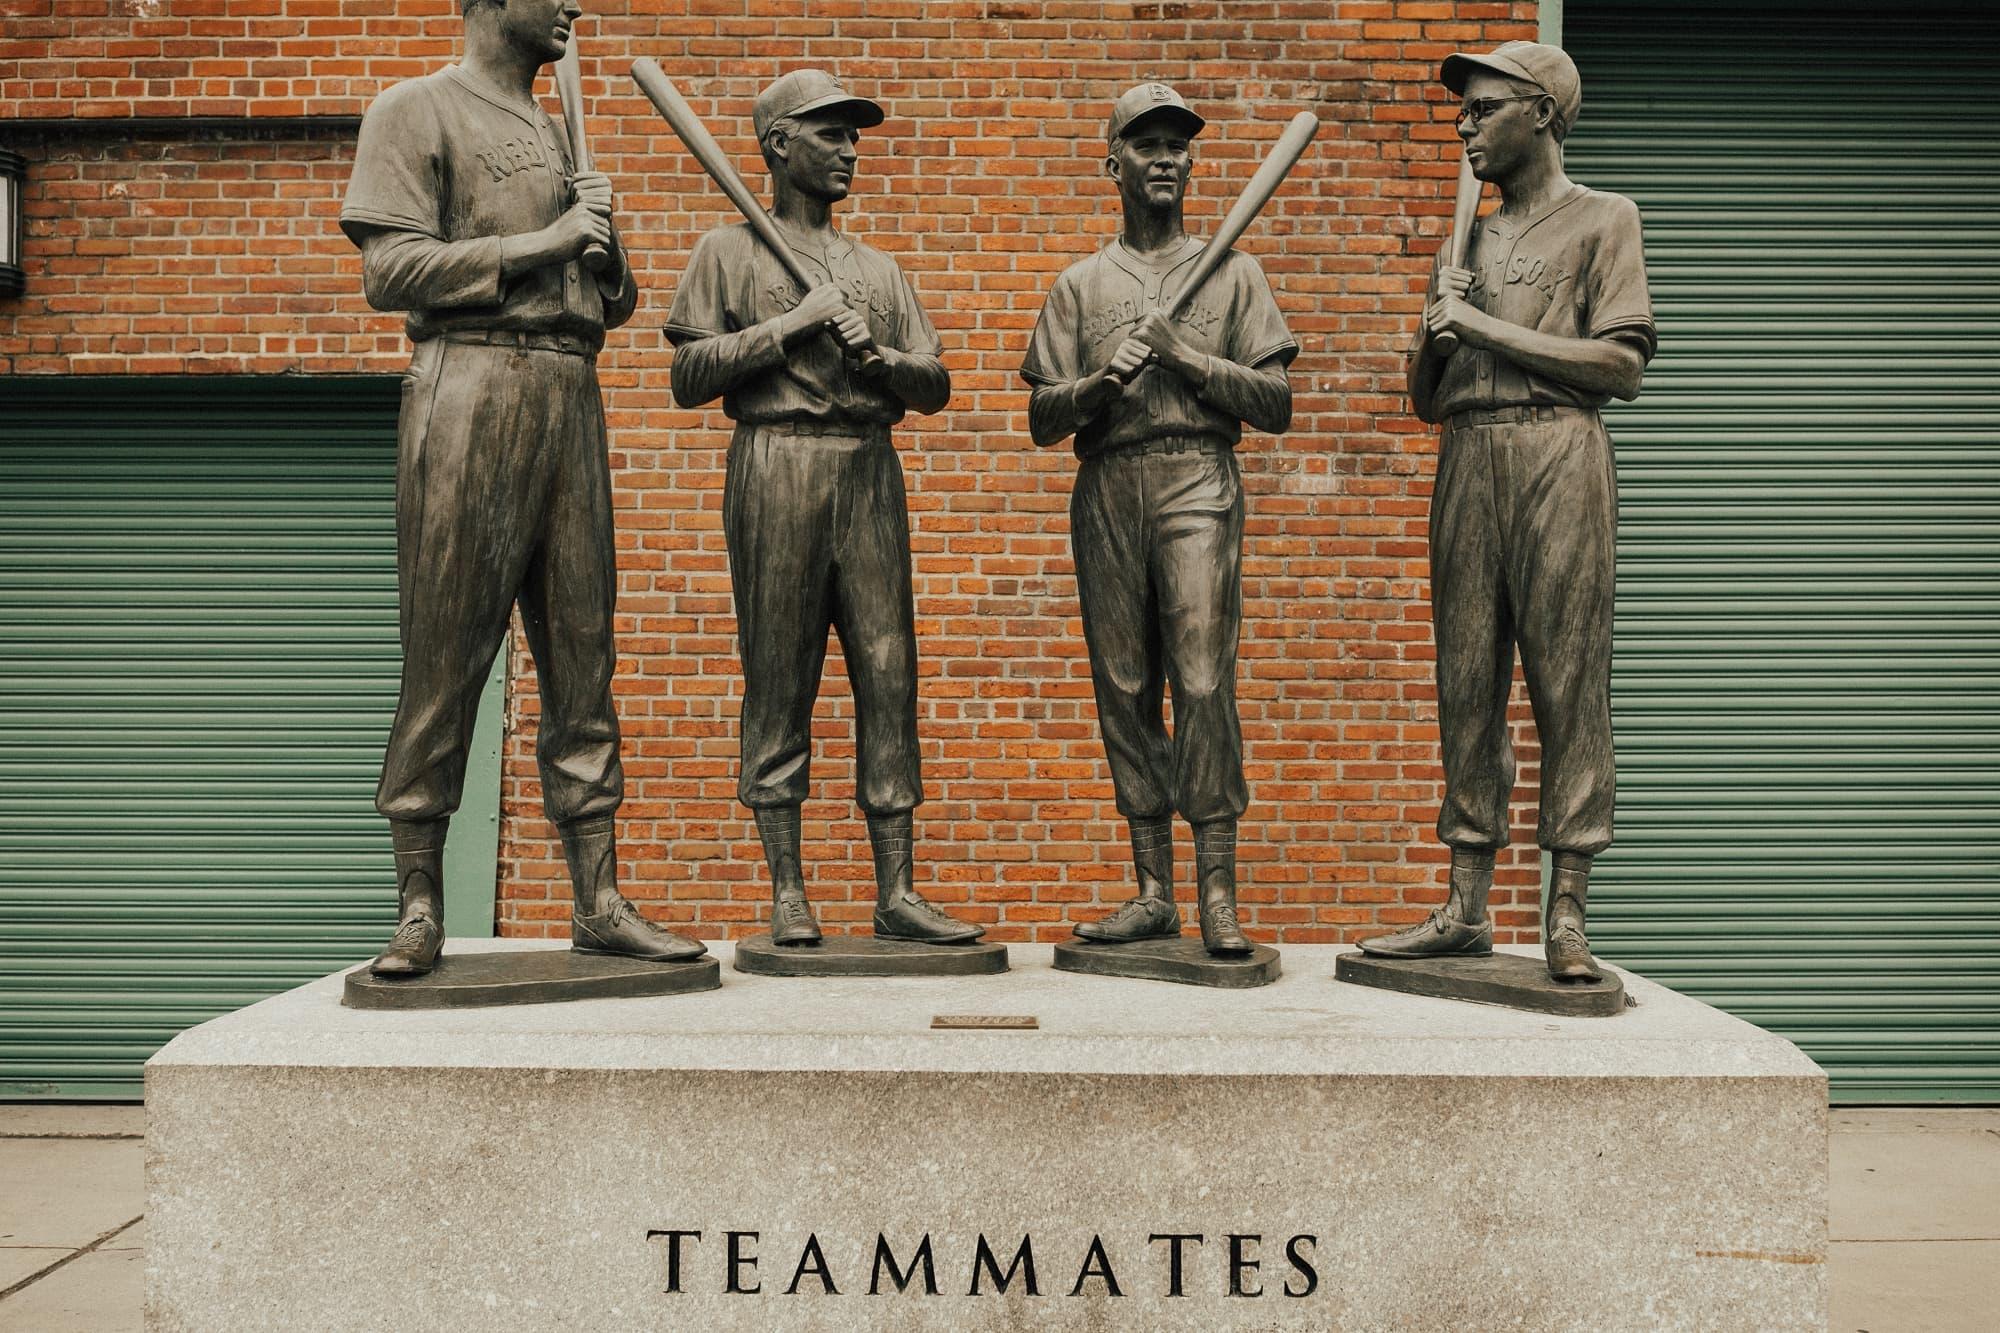 teammates statue at fenway park